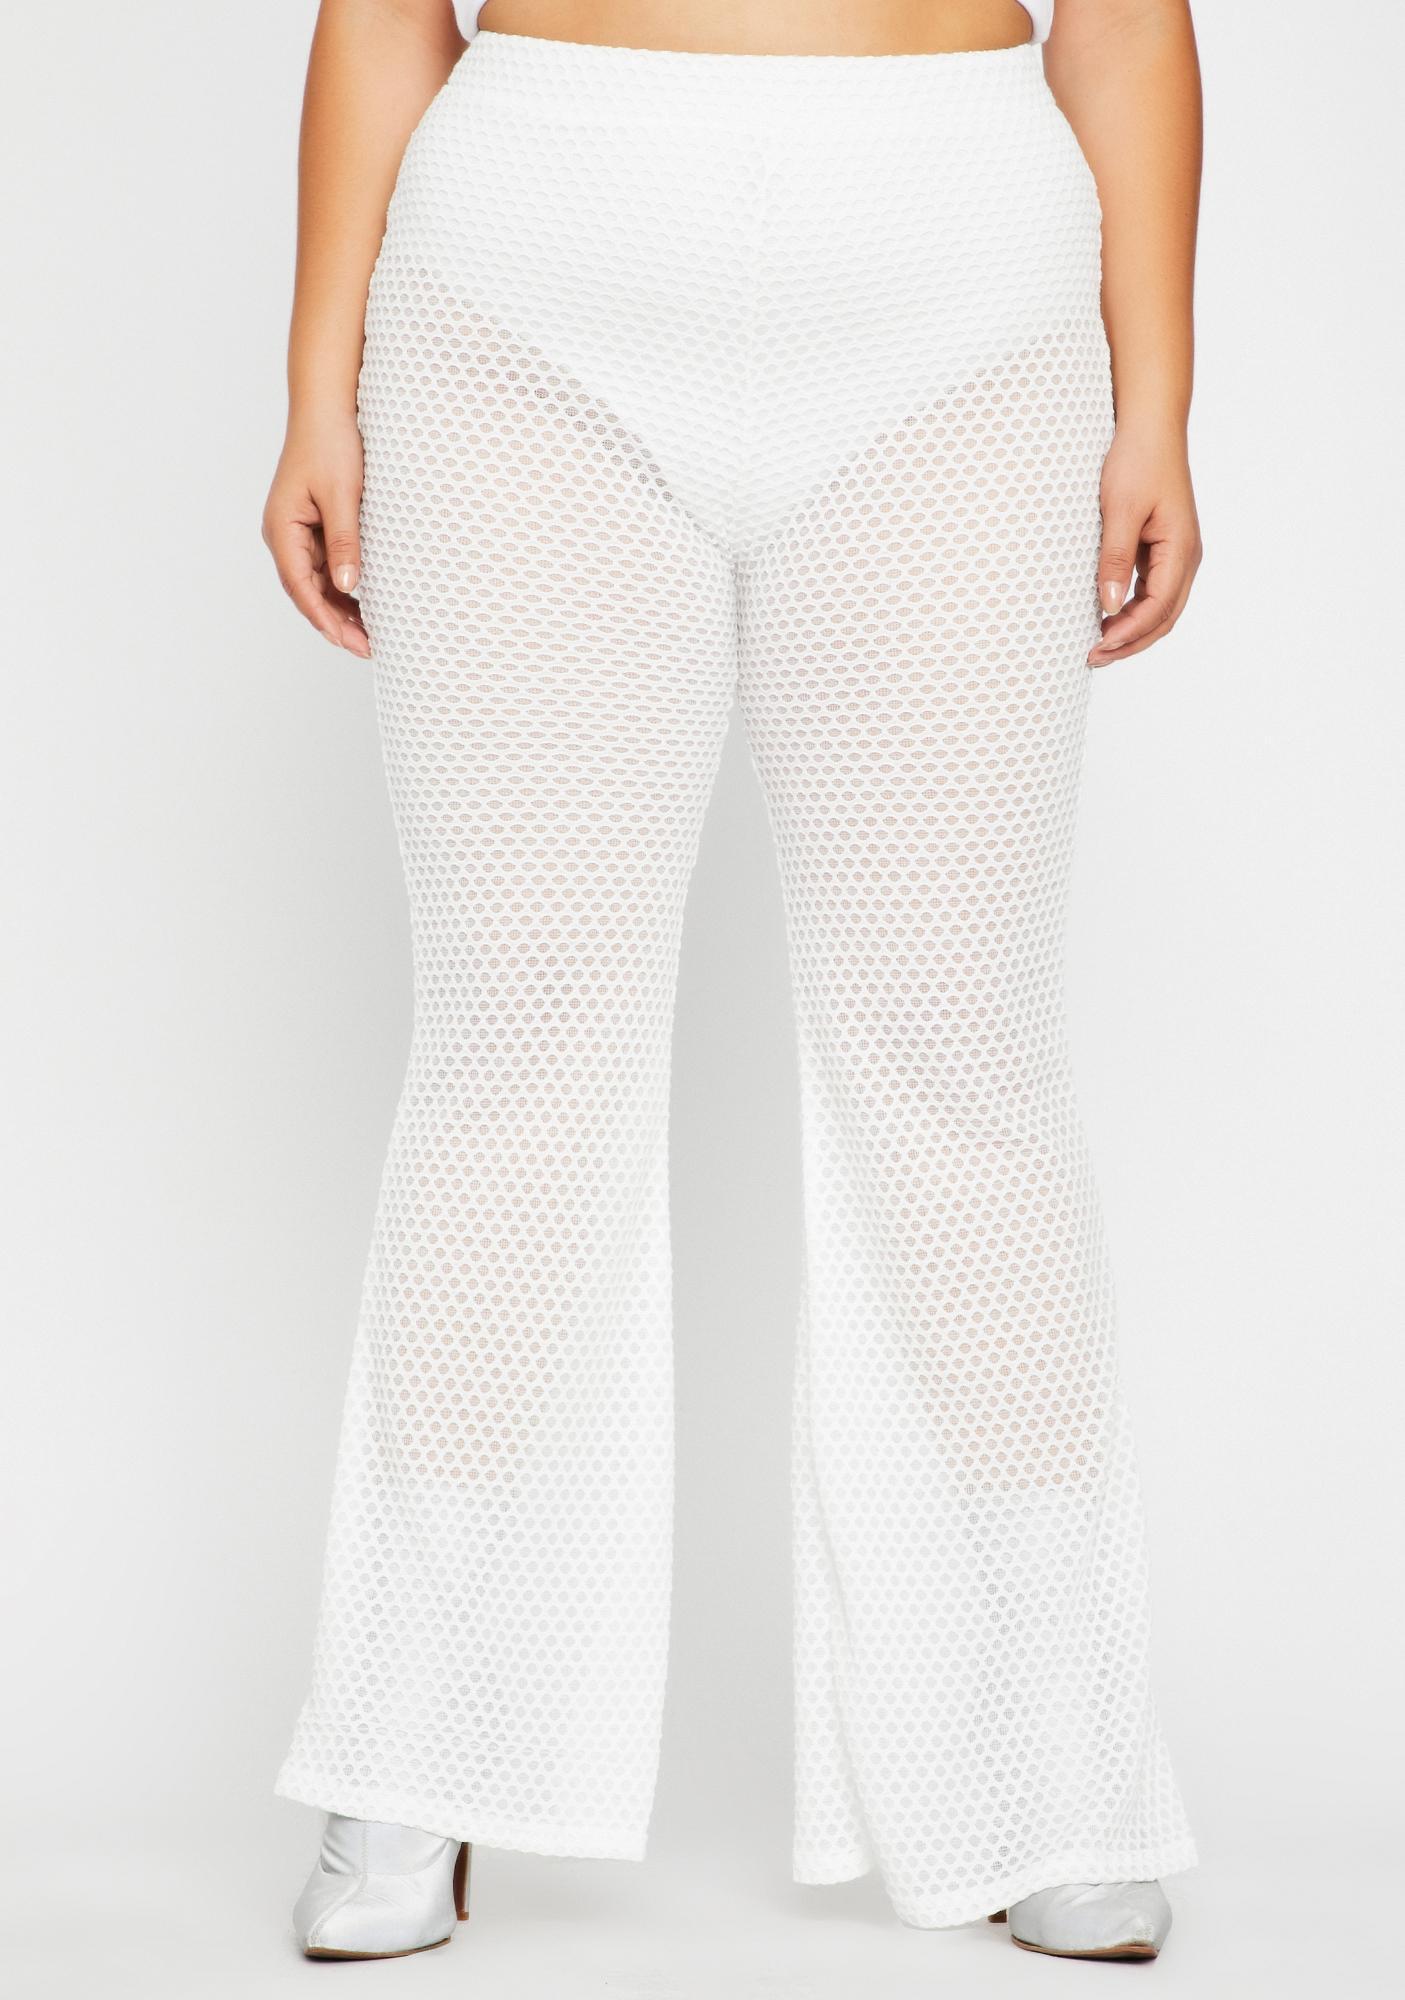 Bliss Ur Total Sextasy Fishnet Pants